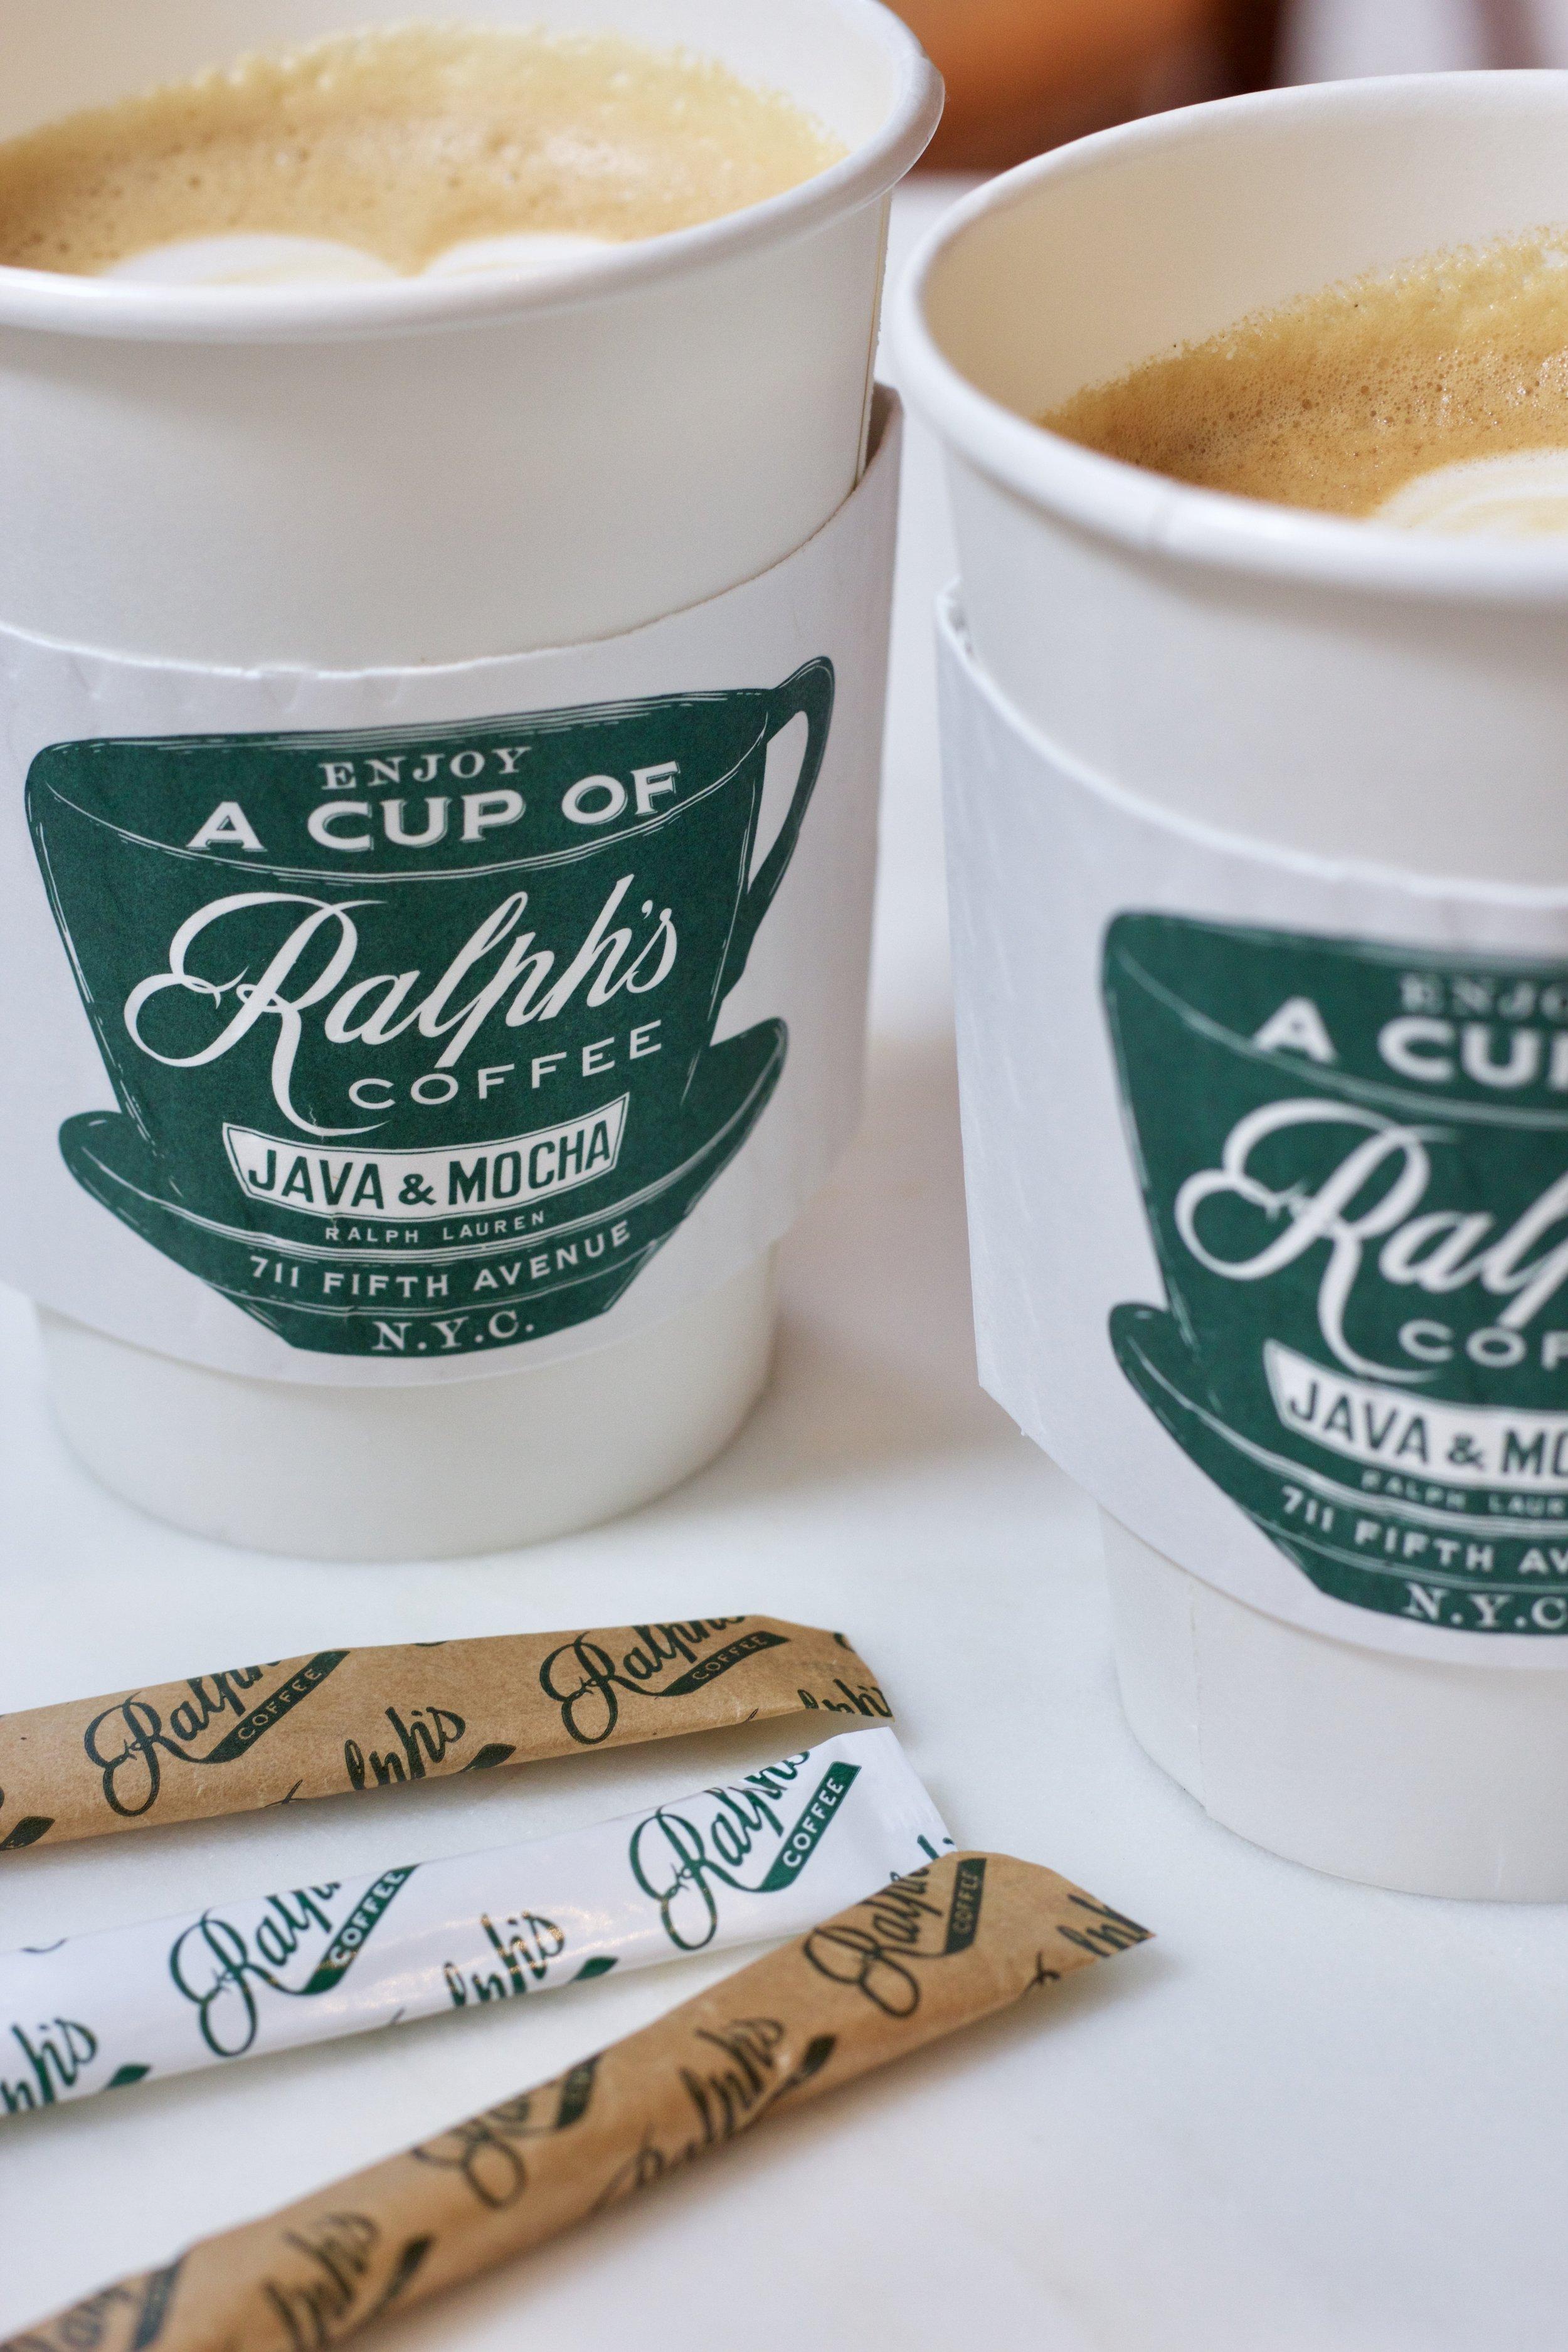 Samantha McNeil Blog // Ralph's Coffee